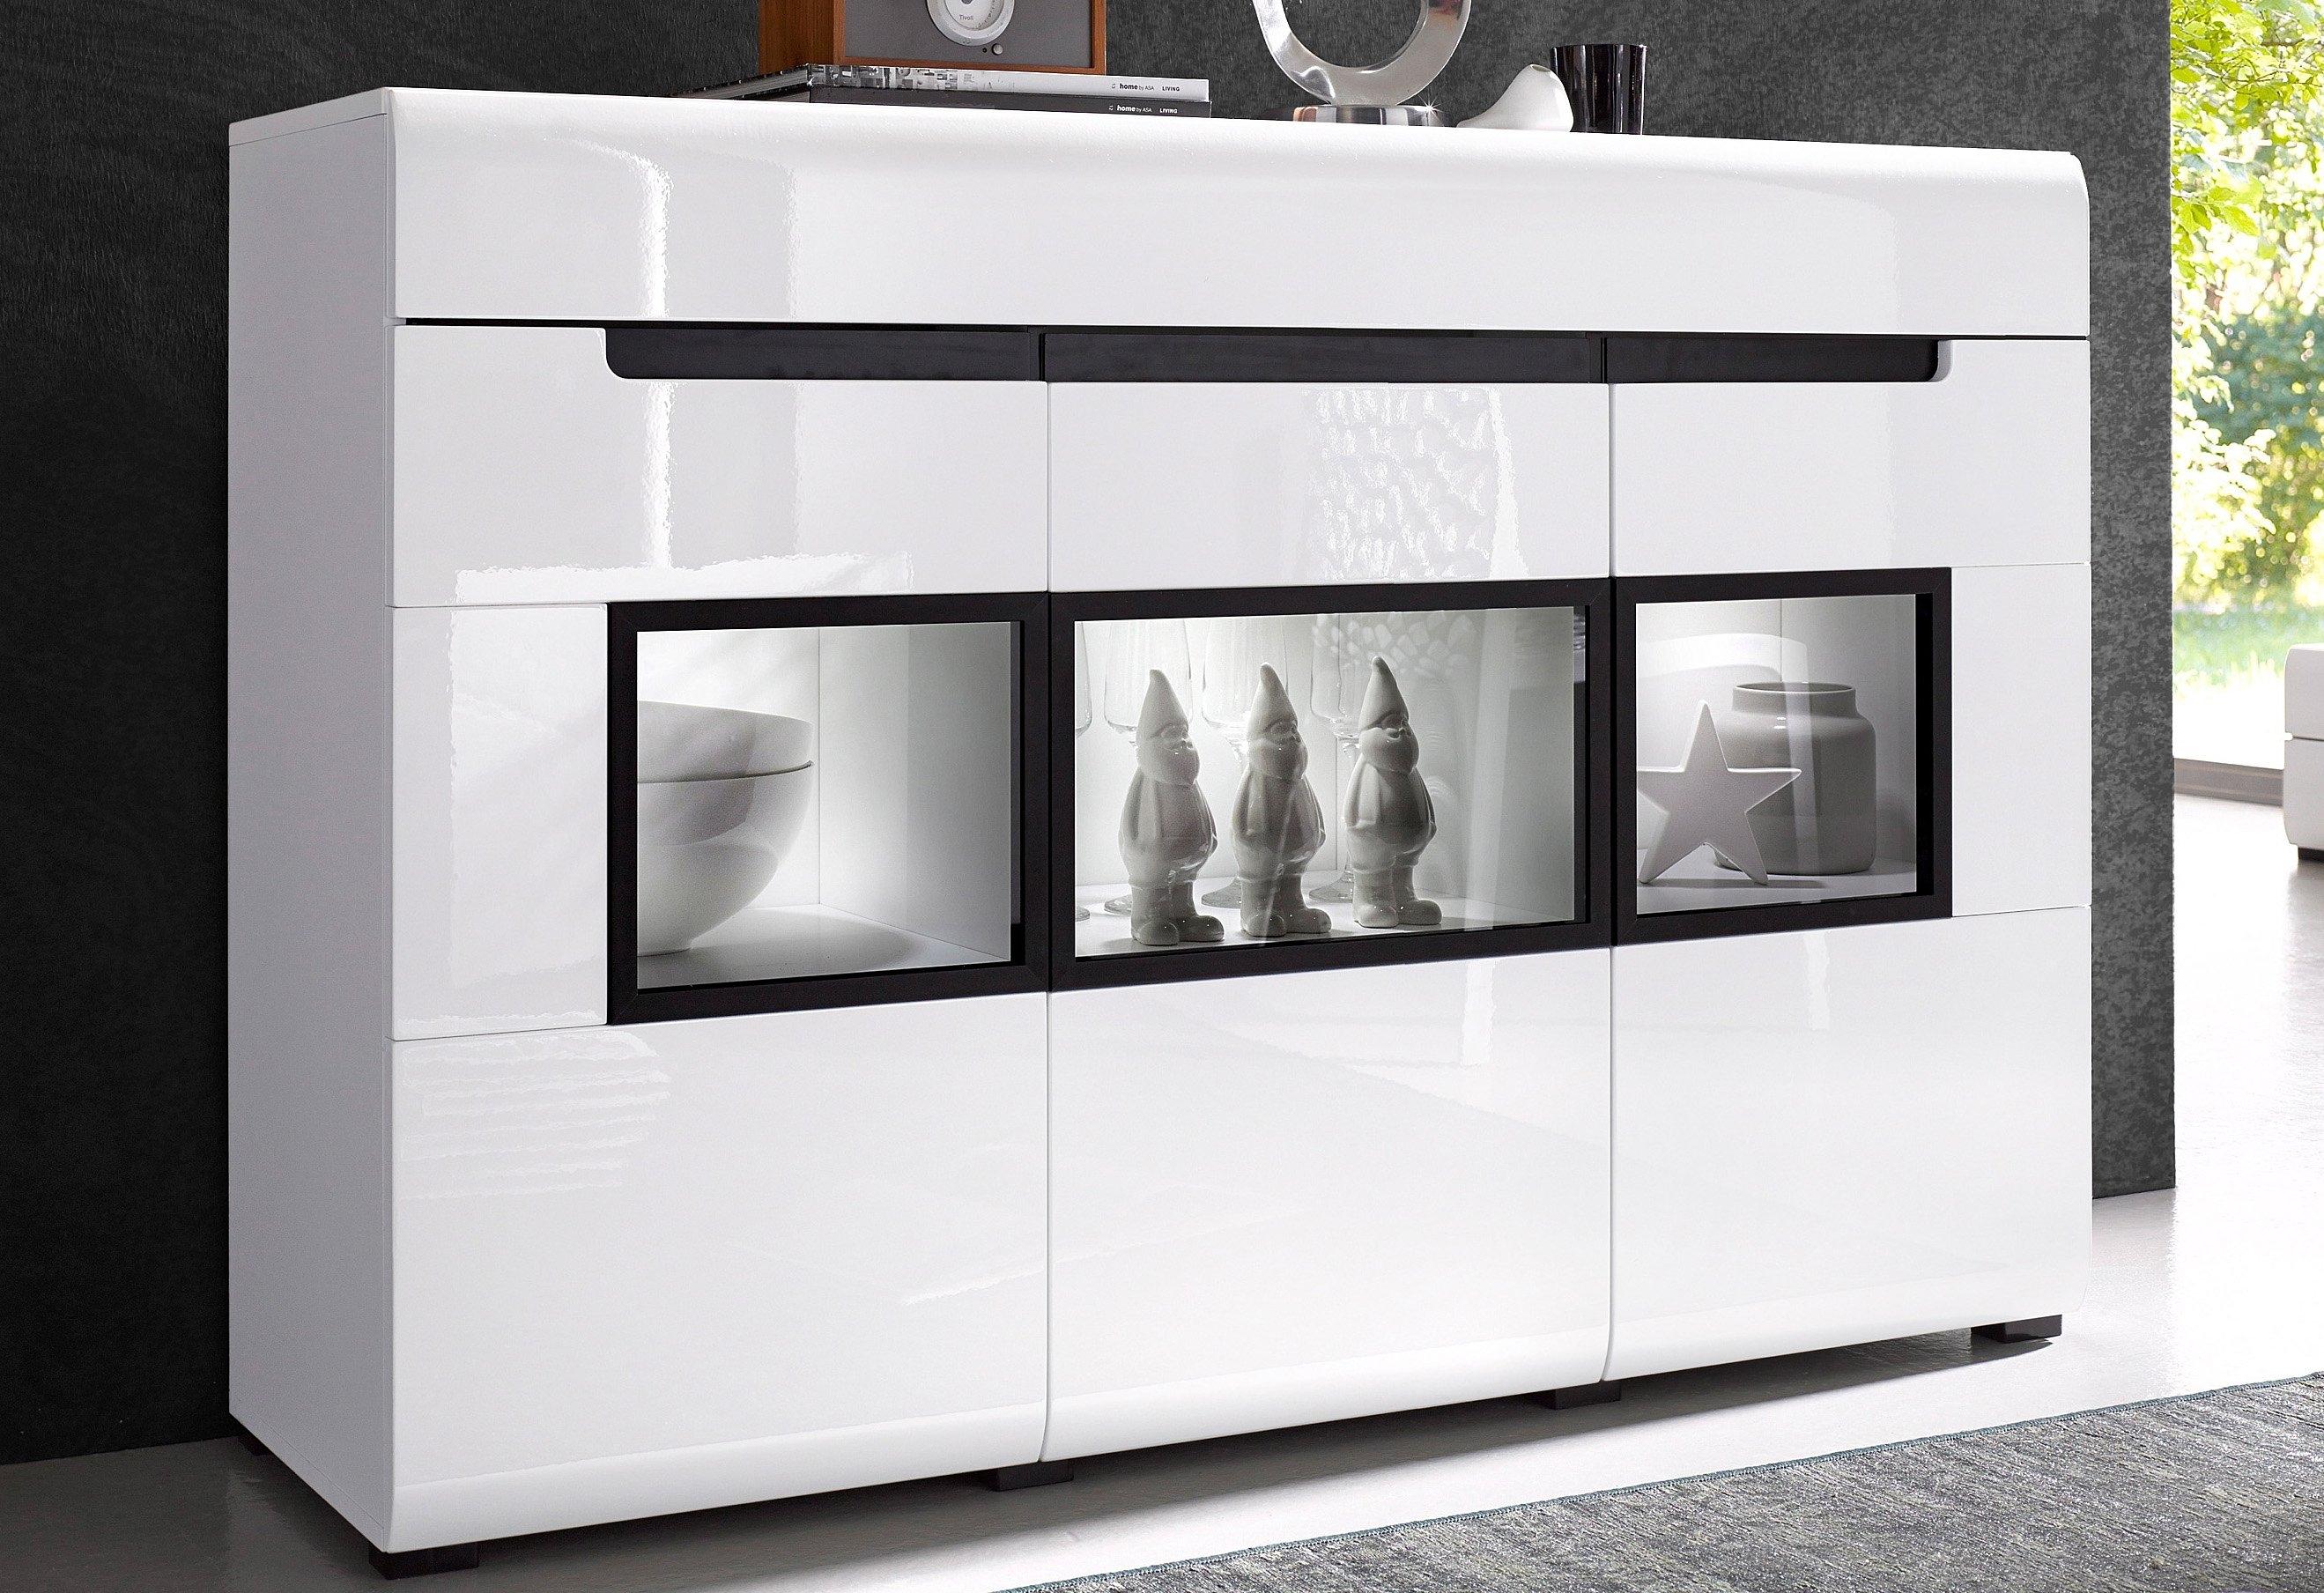 Trendmanufaktur Sideboard breedte 136 cm nu online bestellen